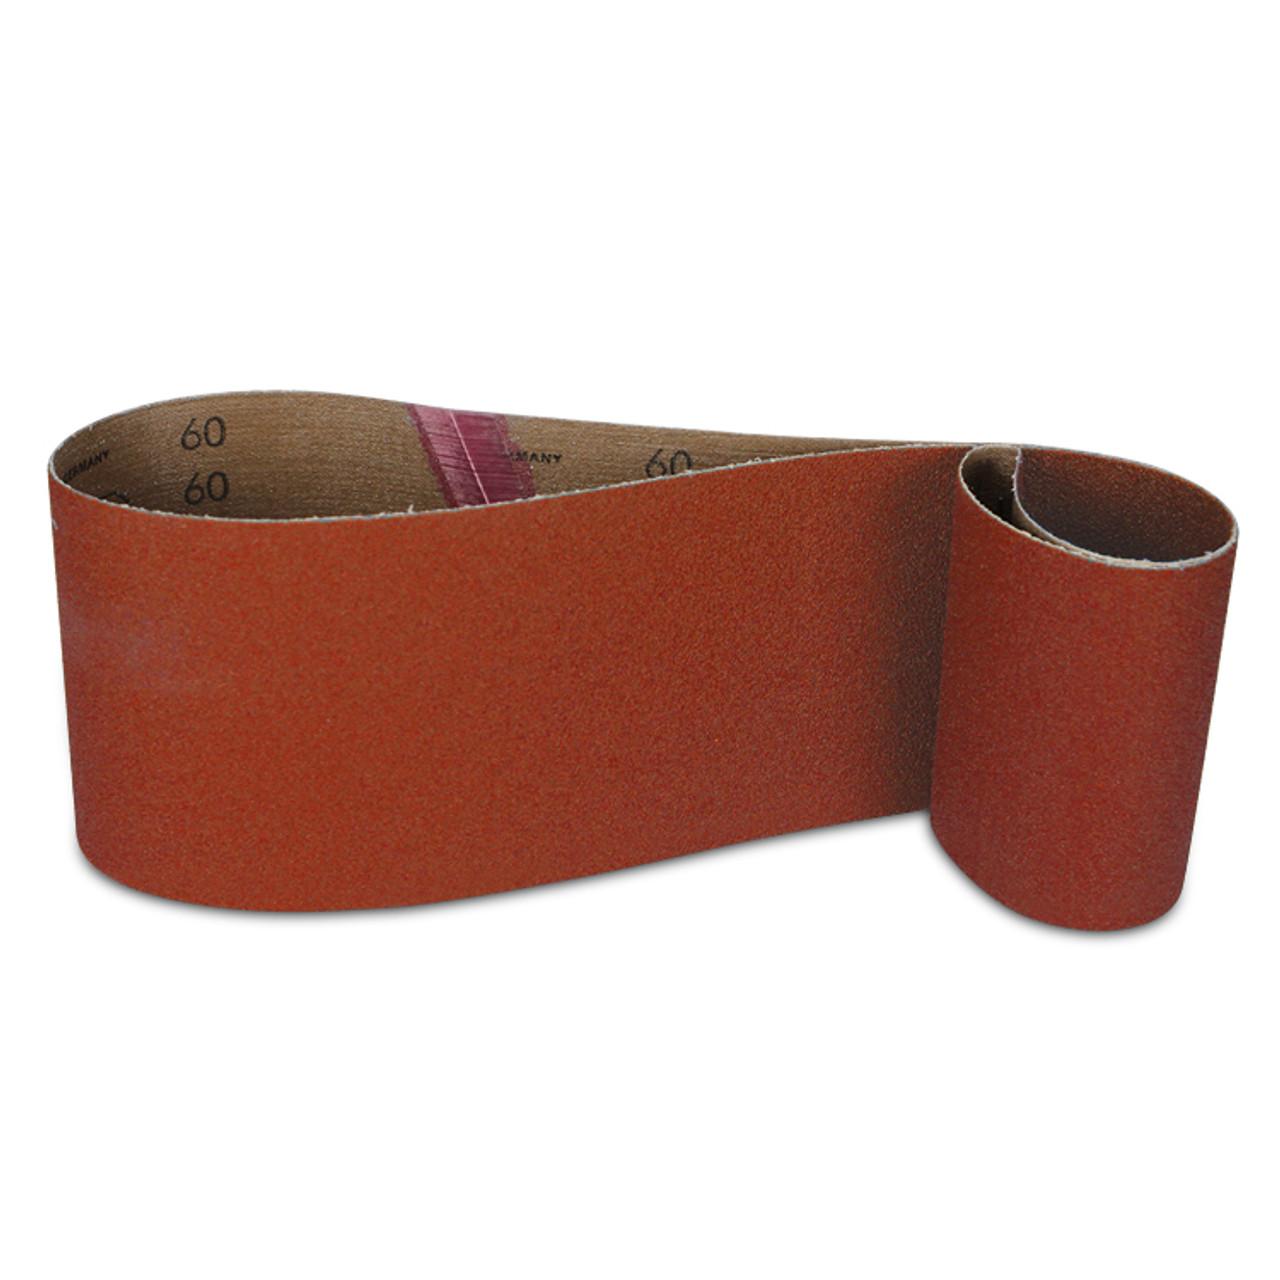 "10 PACK 4/"" x 36/"" Inch 100 Grit A//O Metal /& Wood Sanding Belts Medium Coarse"